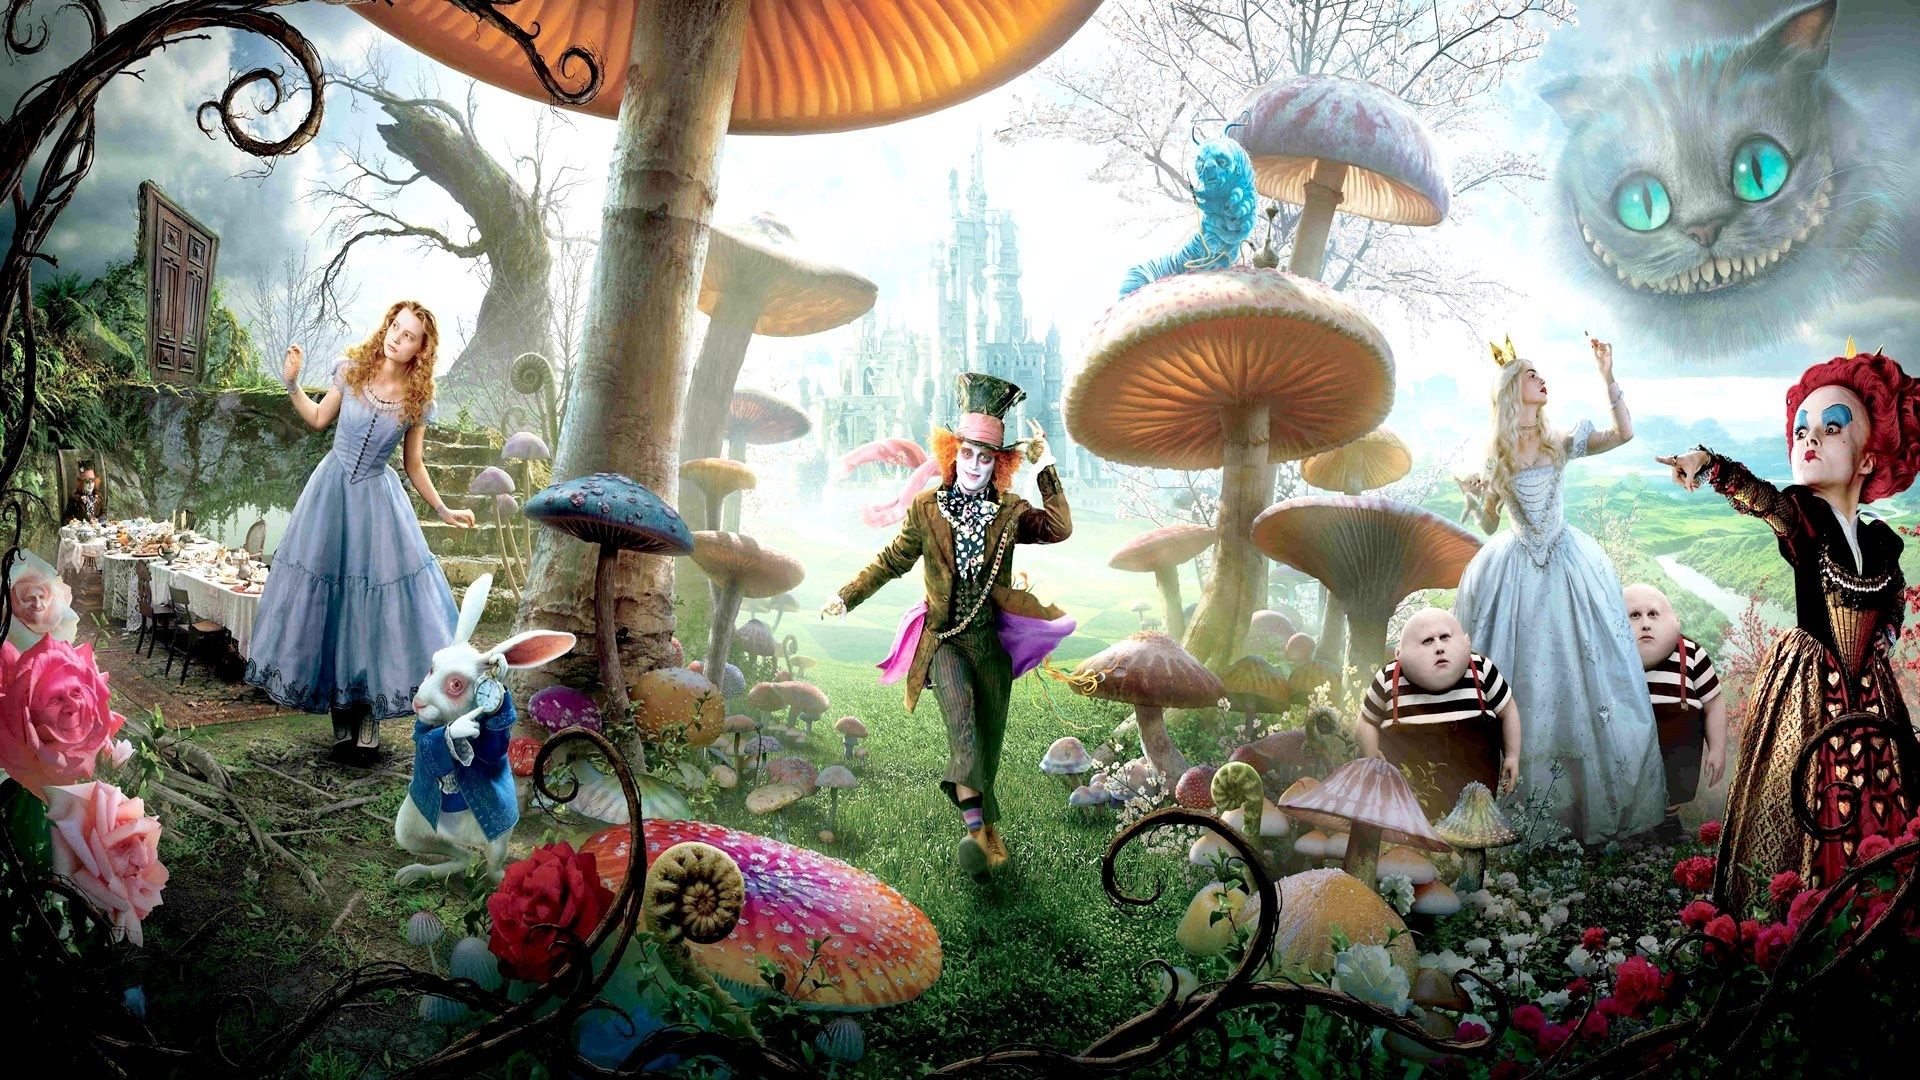 alice in wonderland movie 2016 hd wallpaper #02556